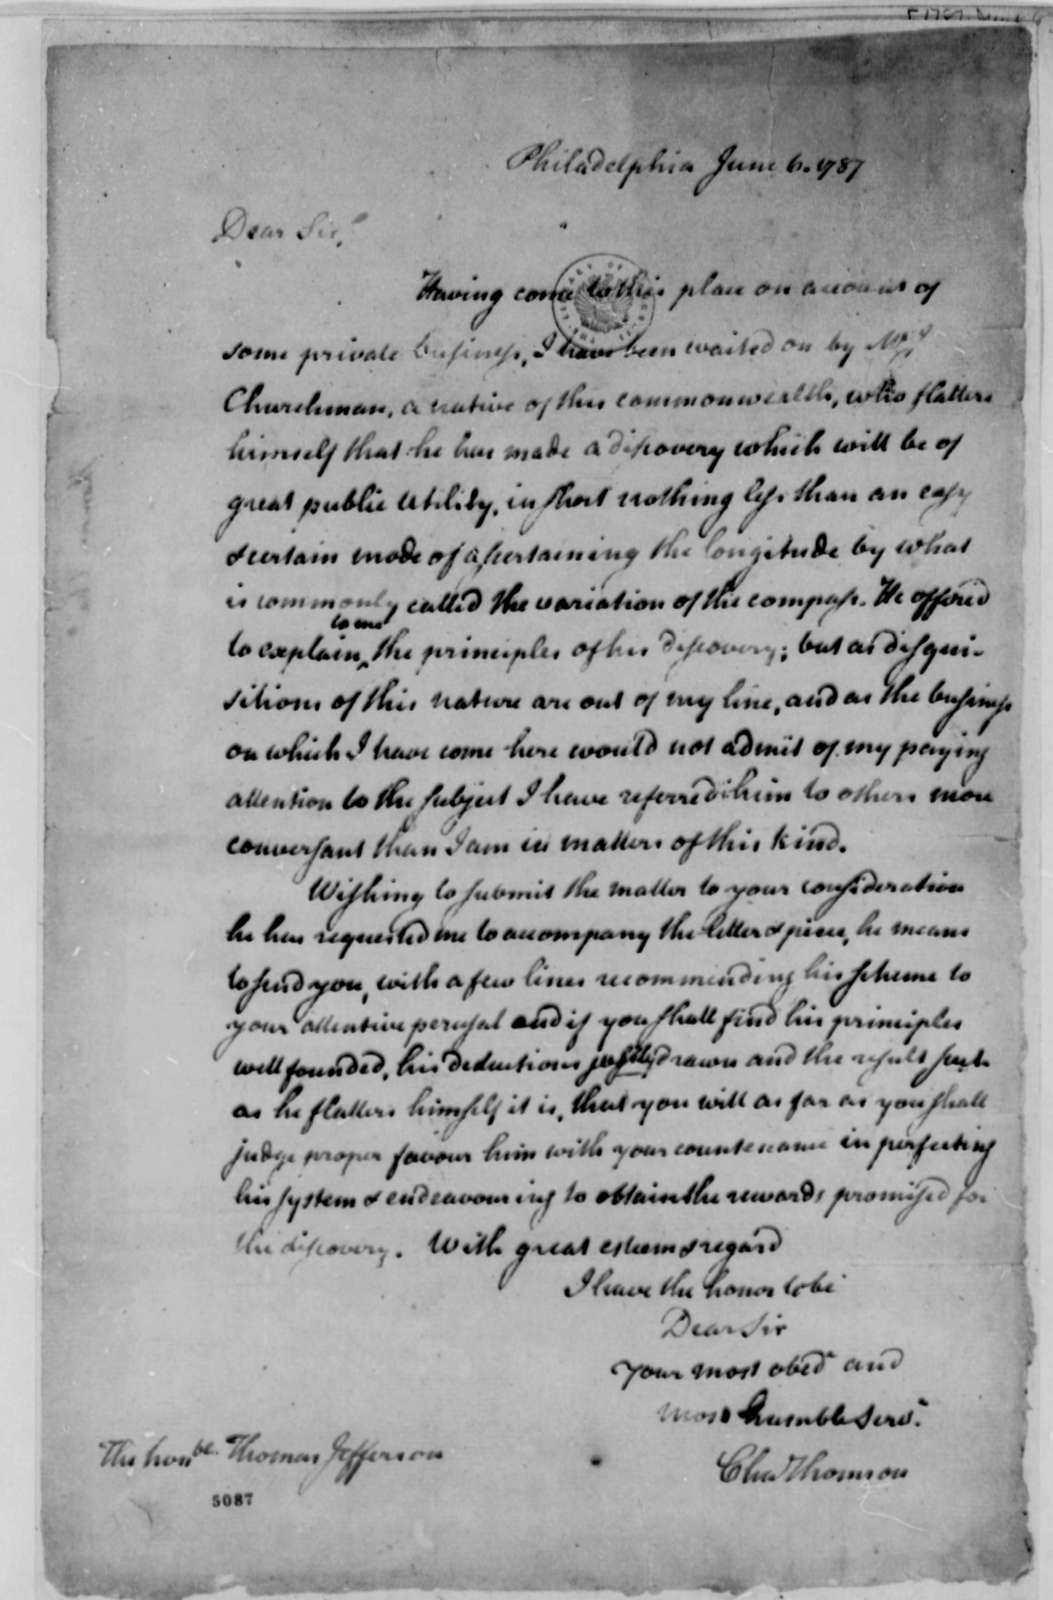 Charles Thomson to Thomas Jefferson, June 6, 1787